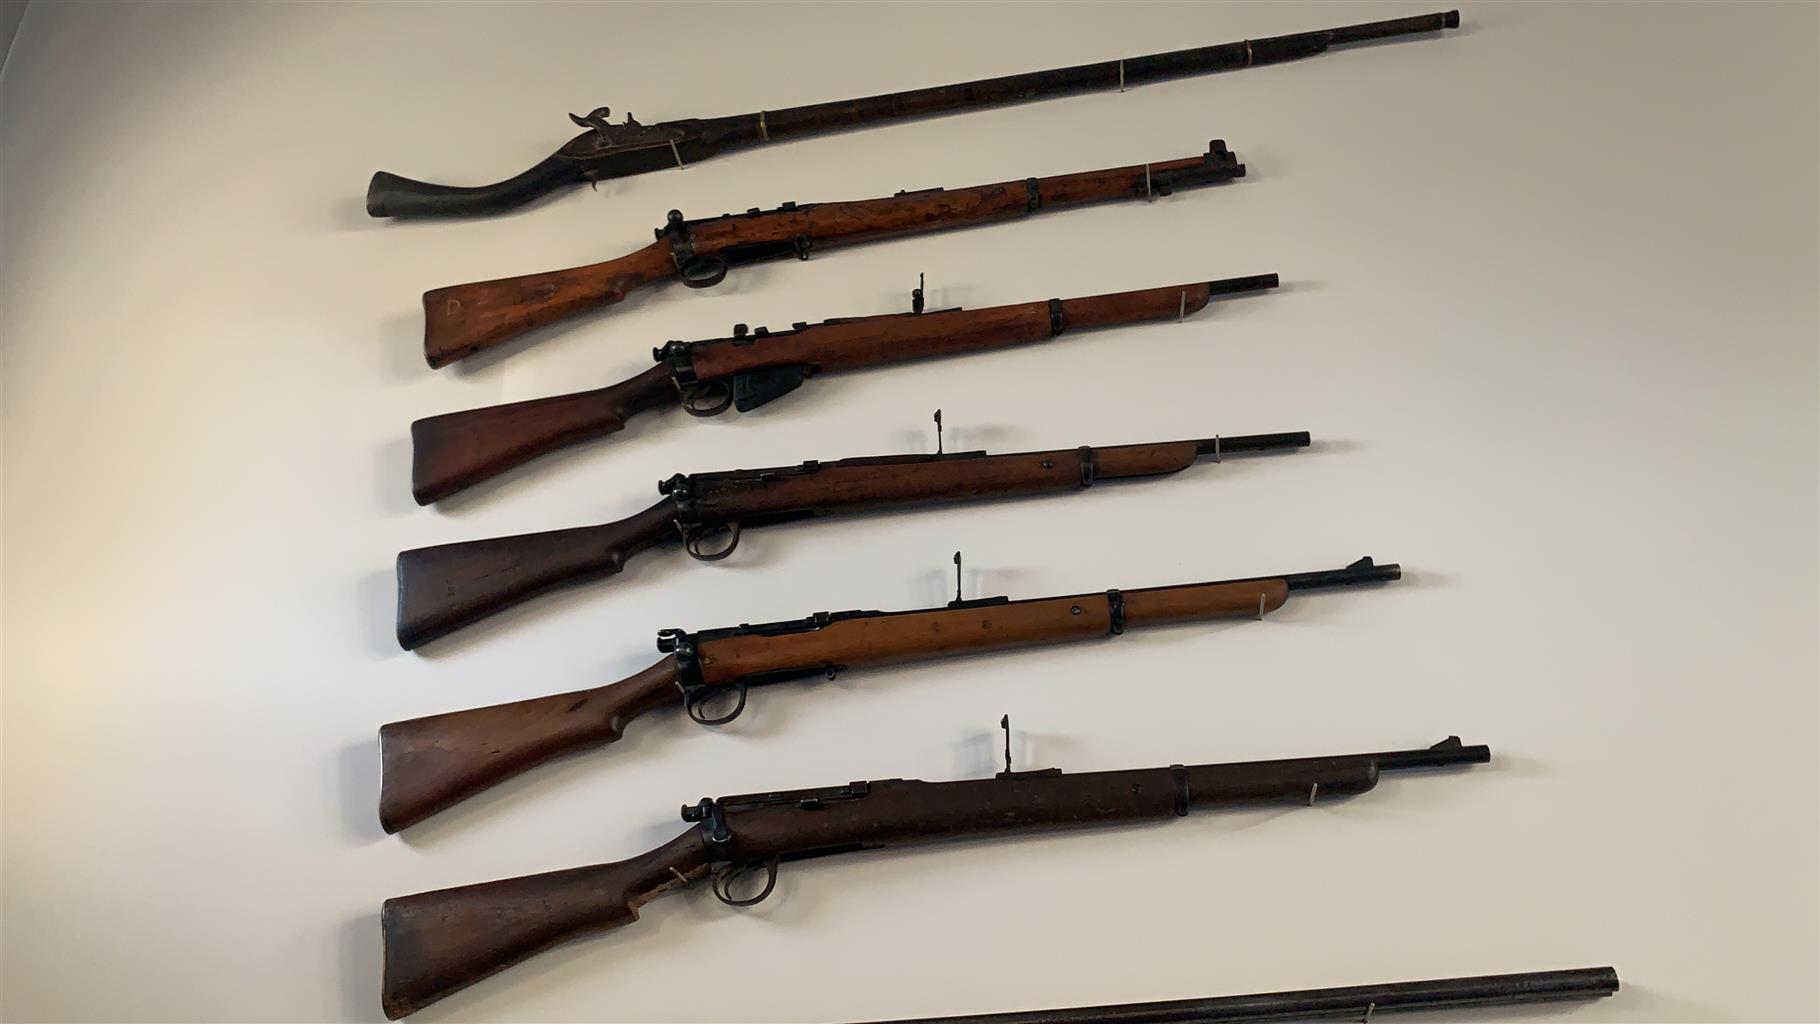 Rifle deactivated guns